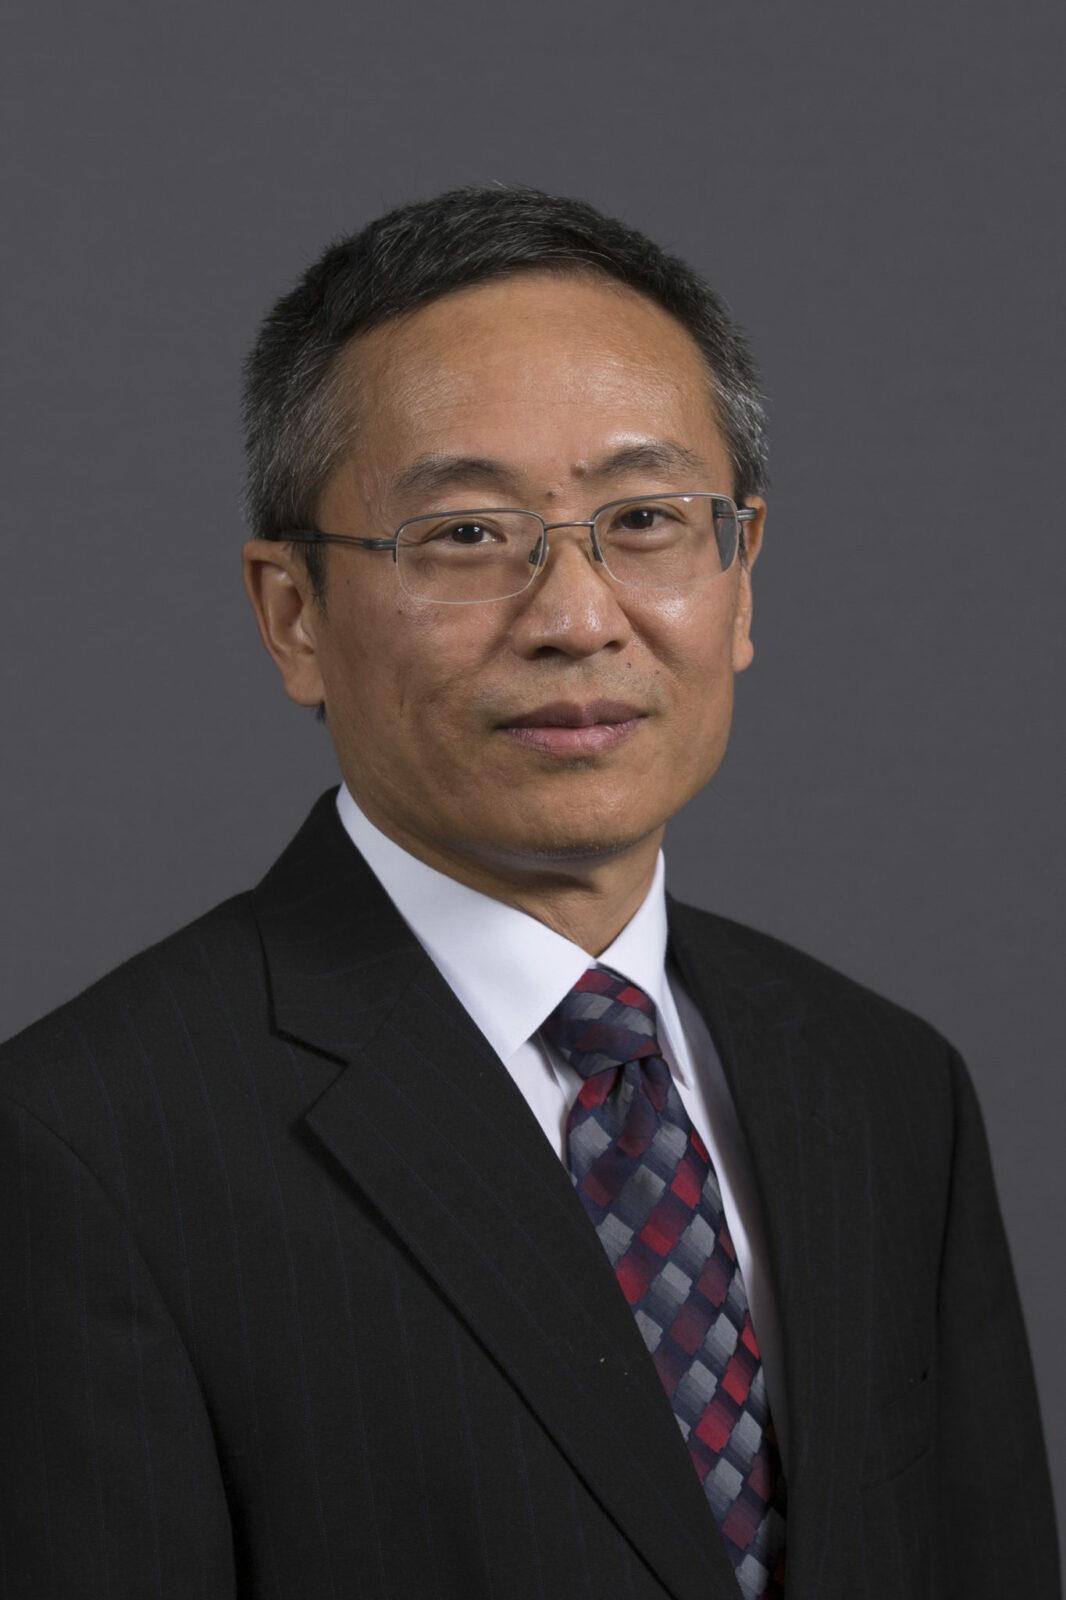 Dr. Xiaoping Du